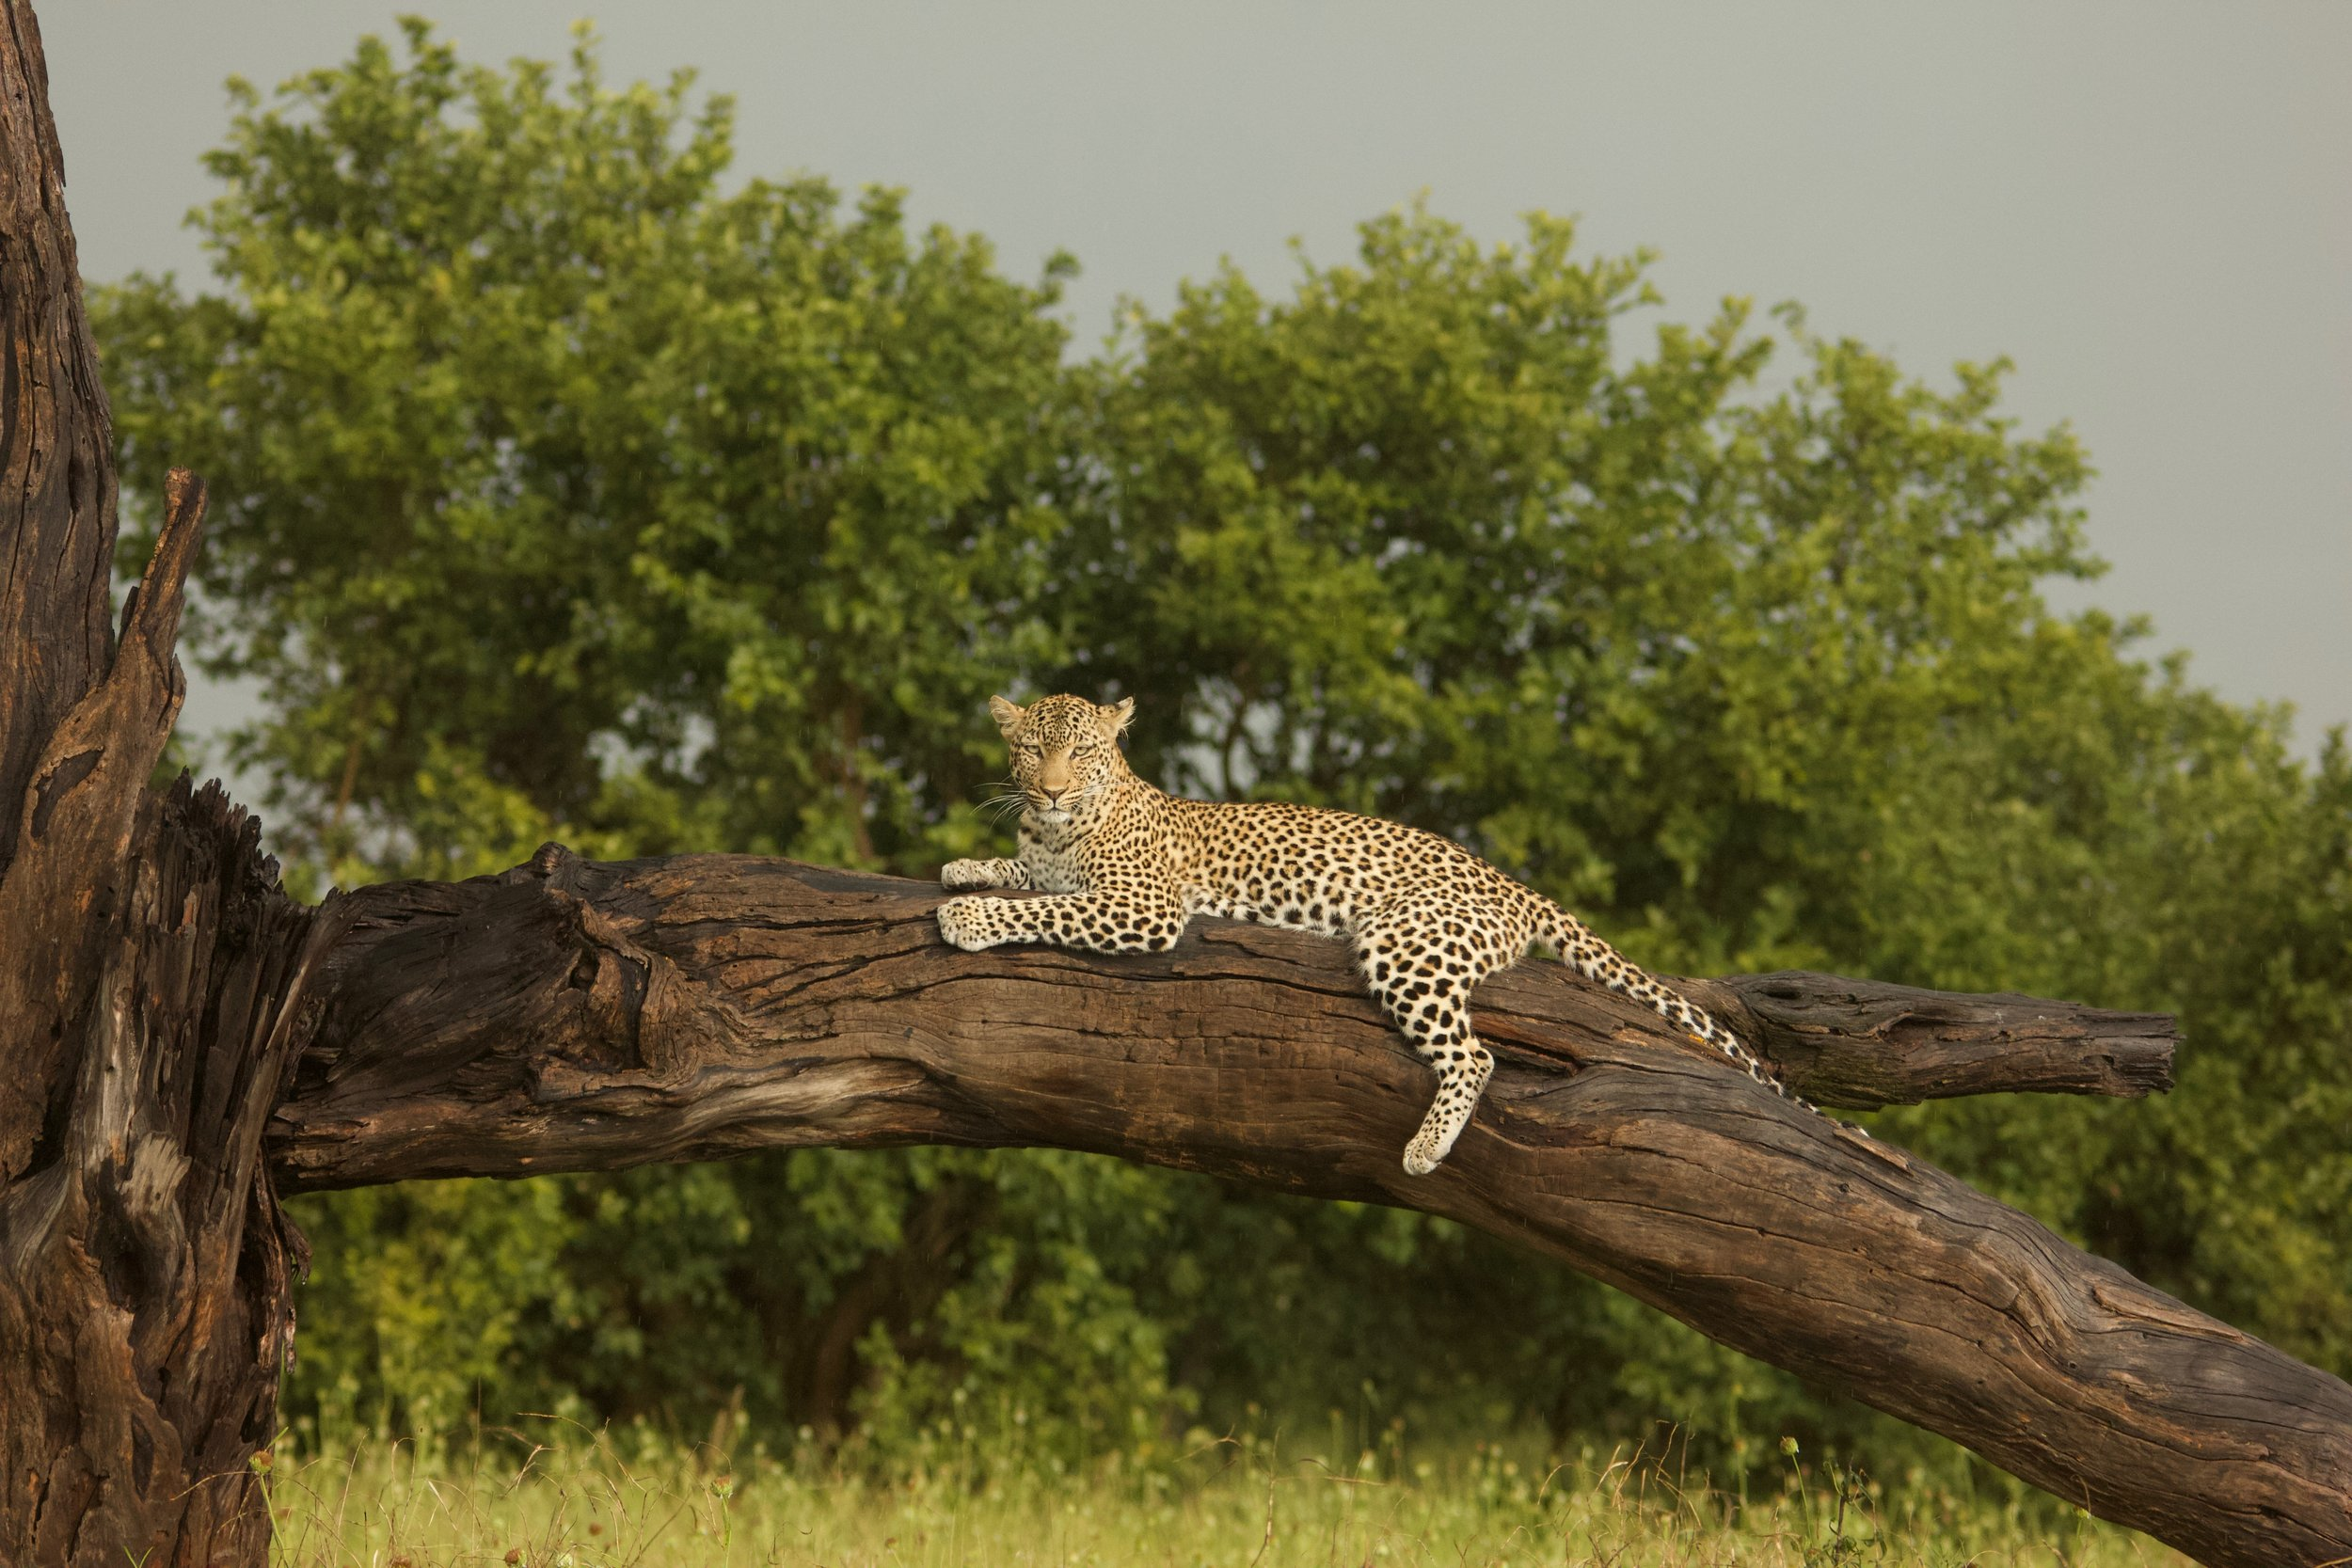 Leopard in the rain. Savuti, Chobe National Park.